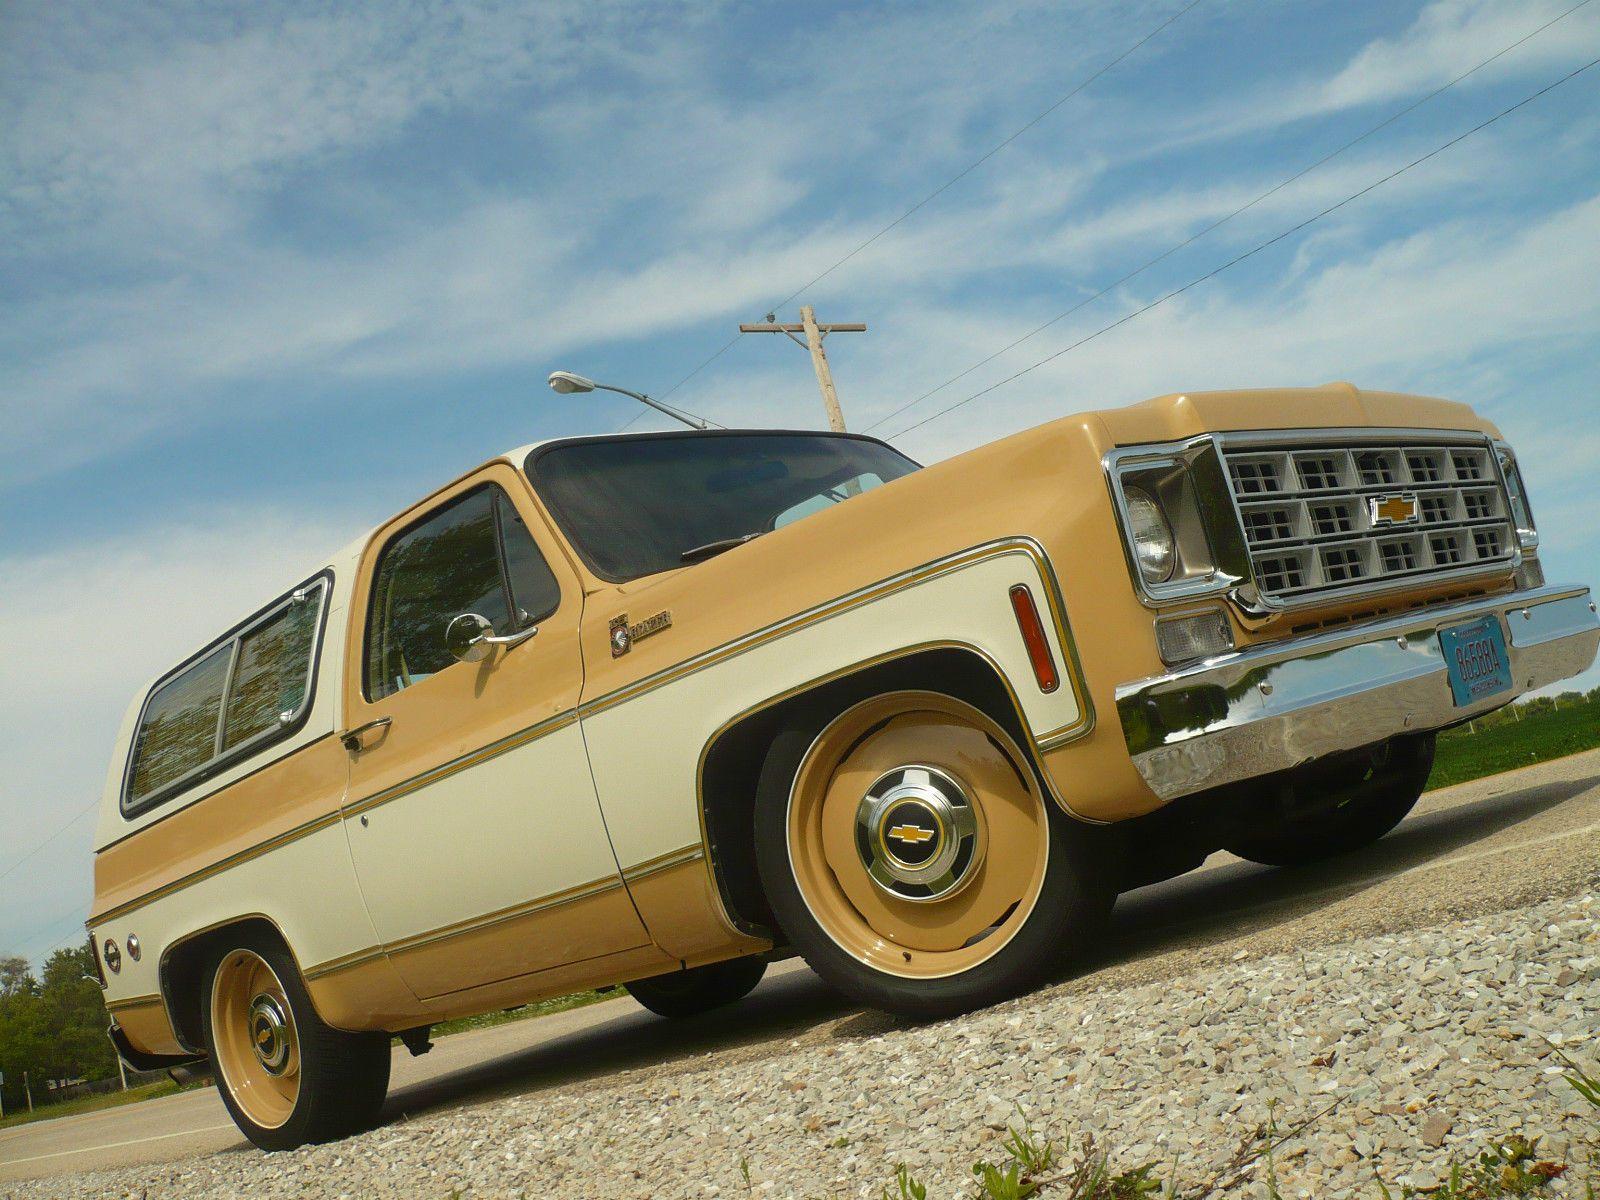 Chevrolet Blazer Ebay Chevrolet Blazer Chevrolet Chevy Trucks